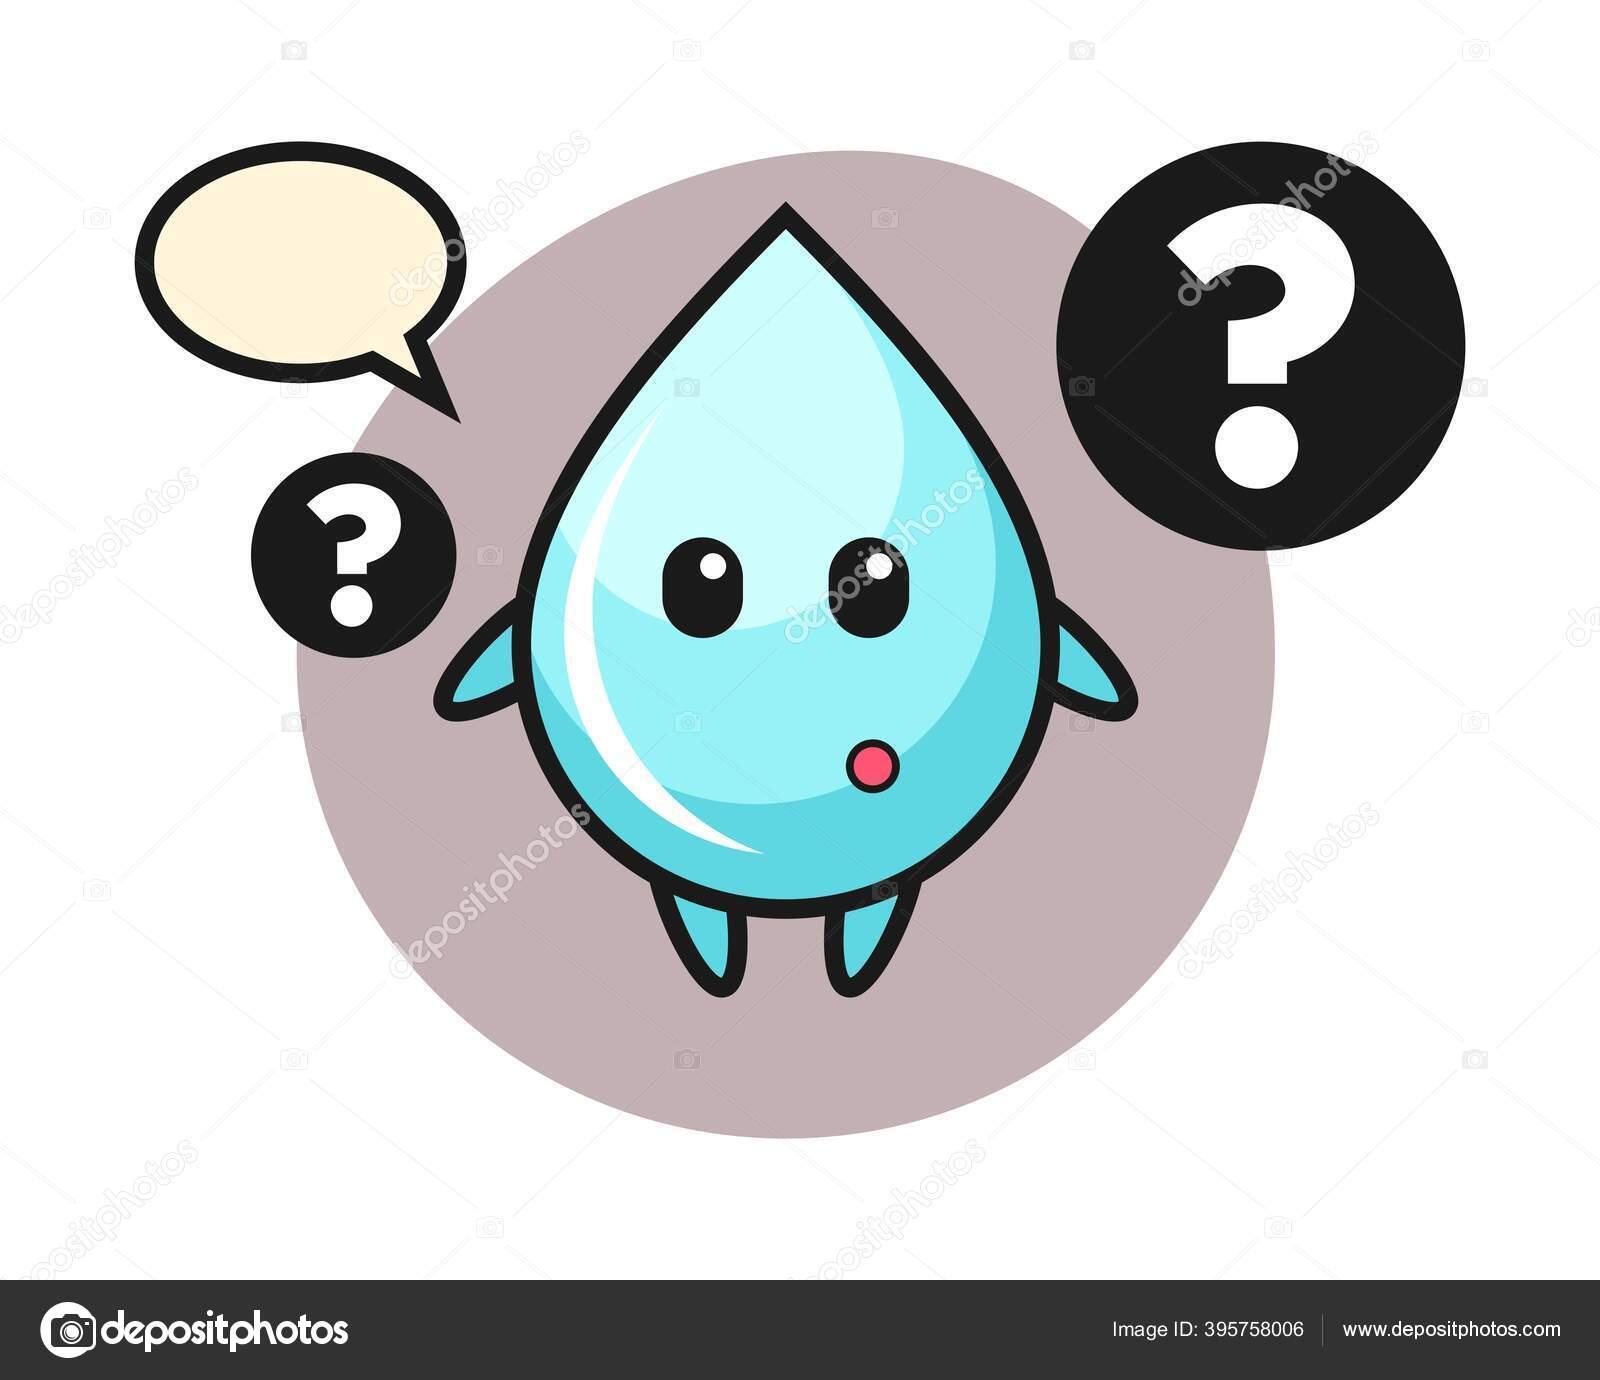 cartoon illustration water drop question mark stock vector c heriyusuf rap gmail com 395758006 https depositphotos com 395758006 stock illustration cartoon illustration water drop question html